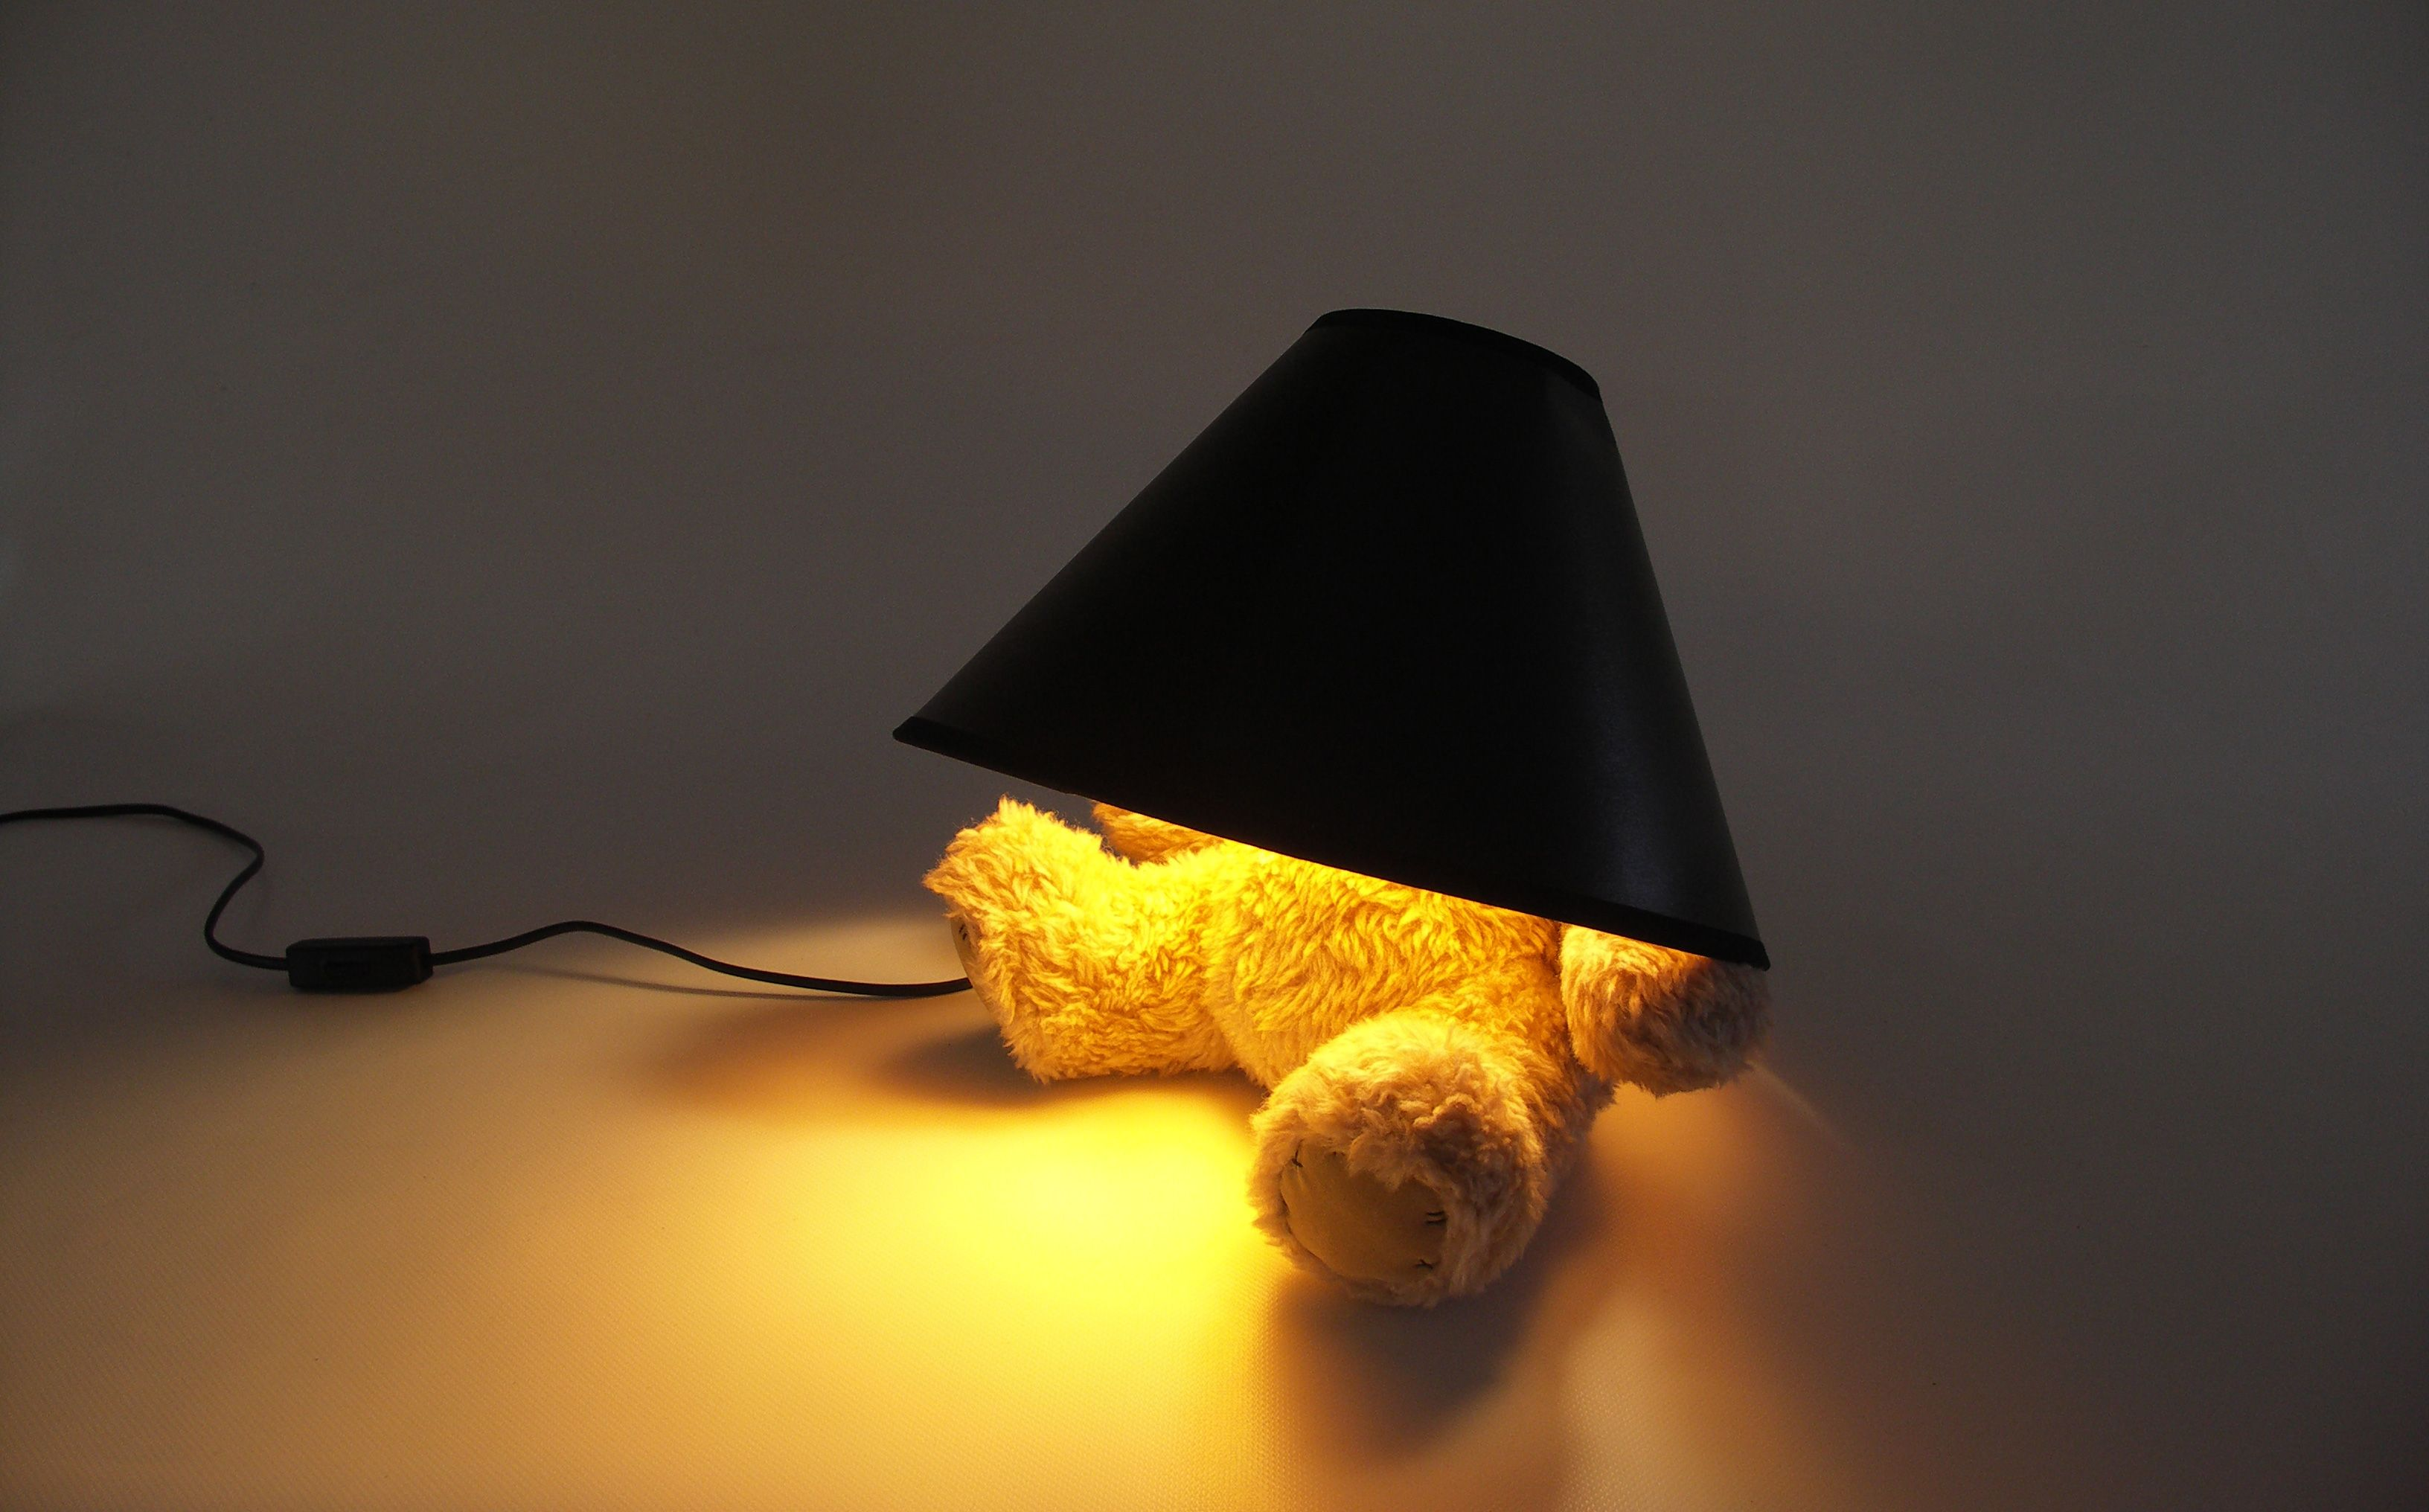 Teddy Bear Lamp Creative Lamps Lampshades Table Lamp